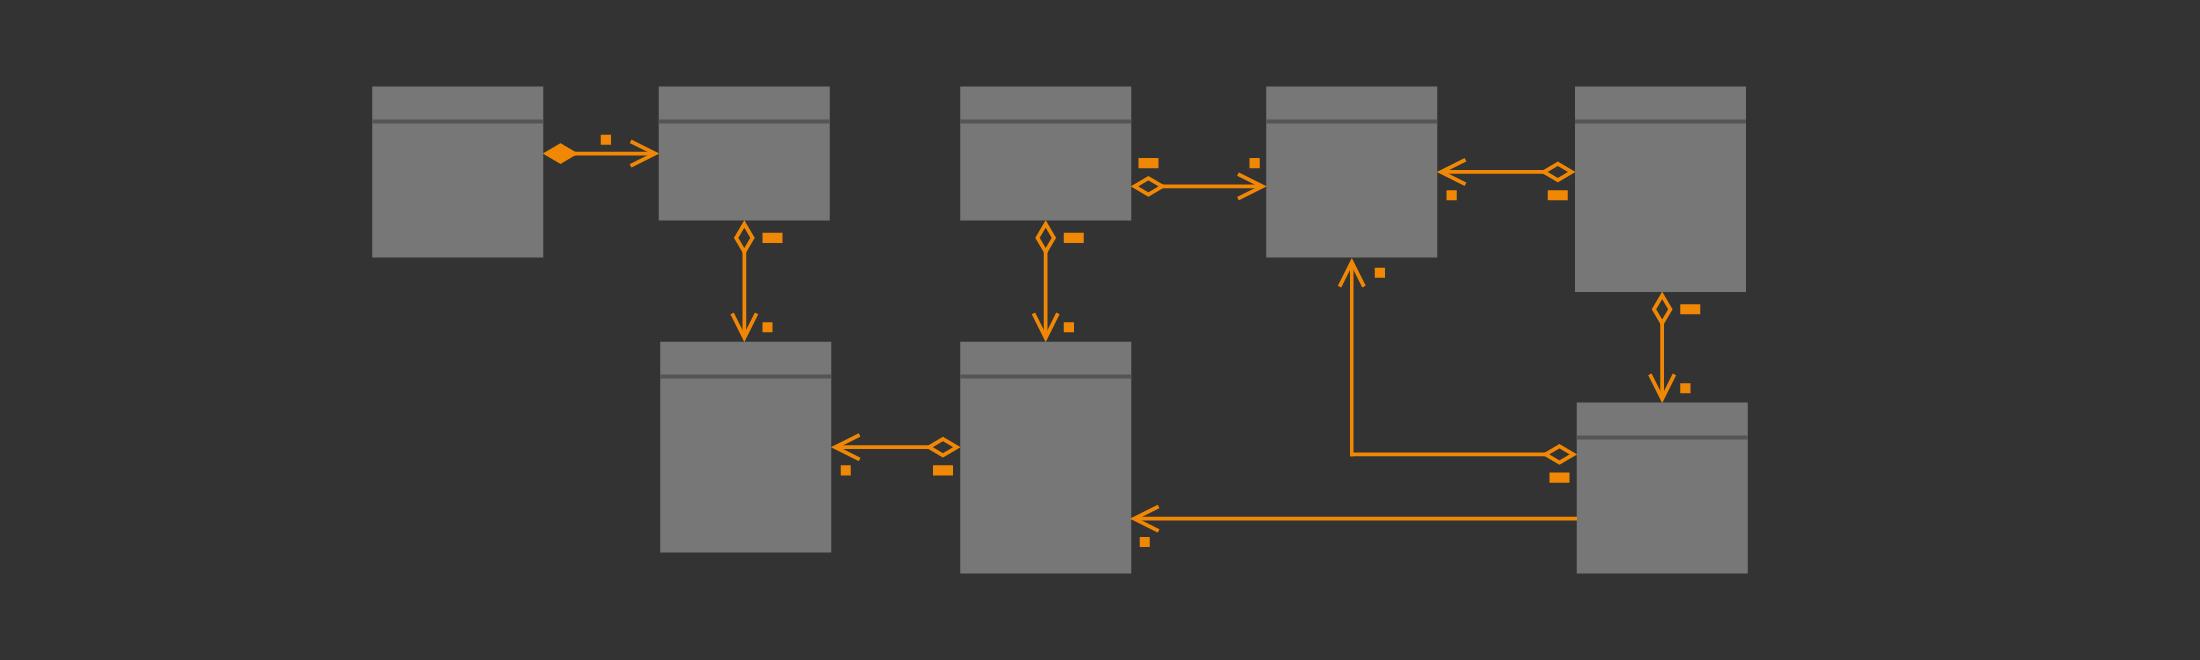 Uml Class Diagrams In Draw Io Draw Io